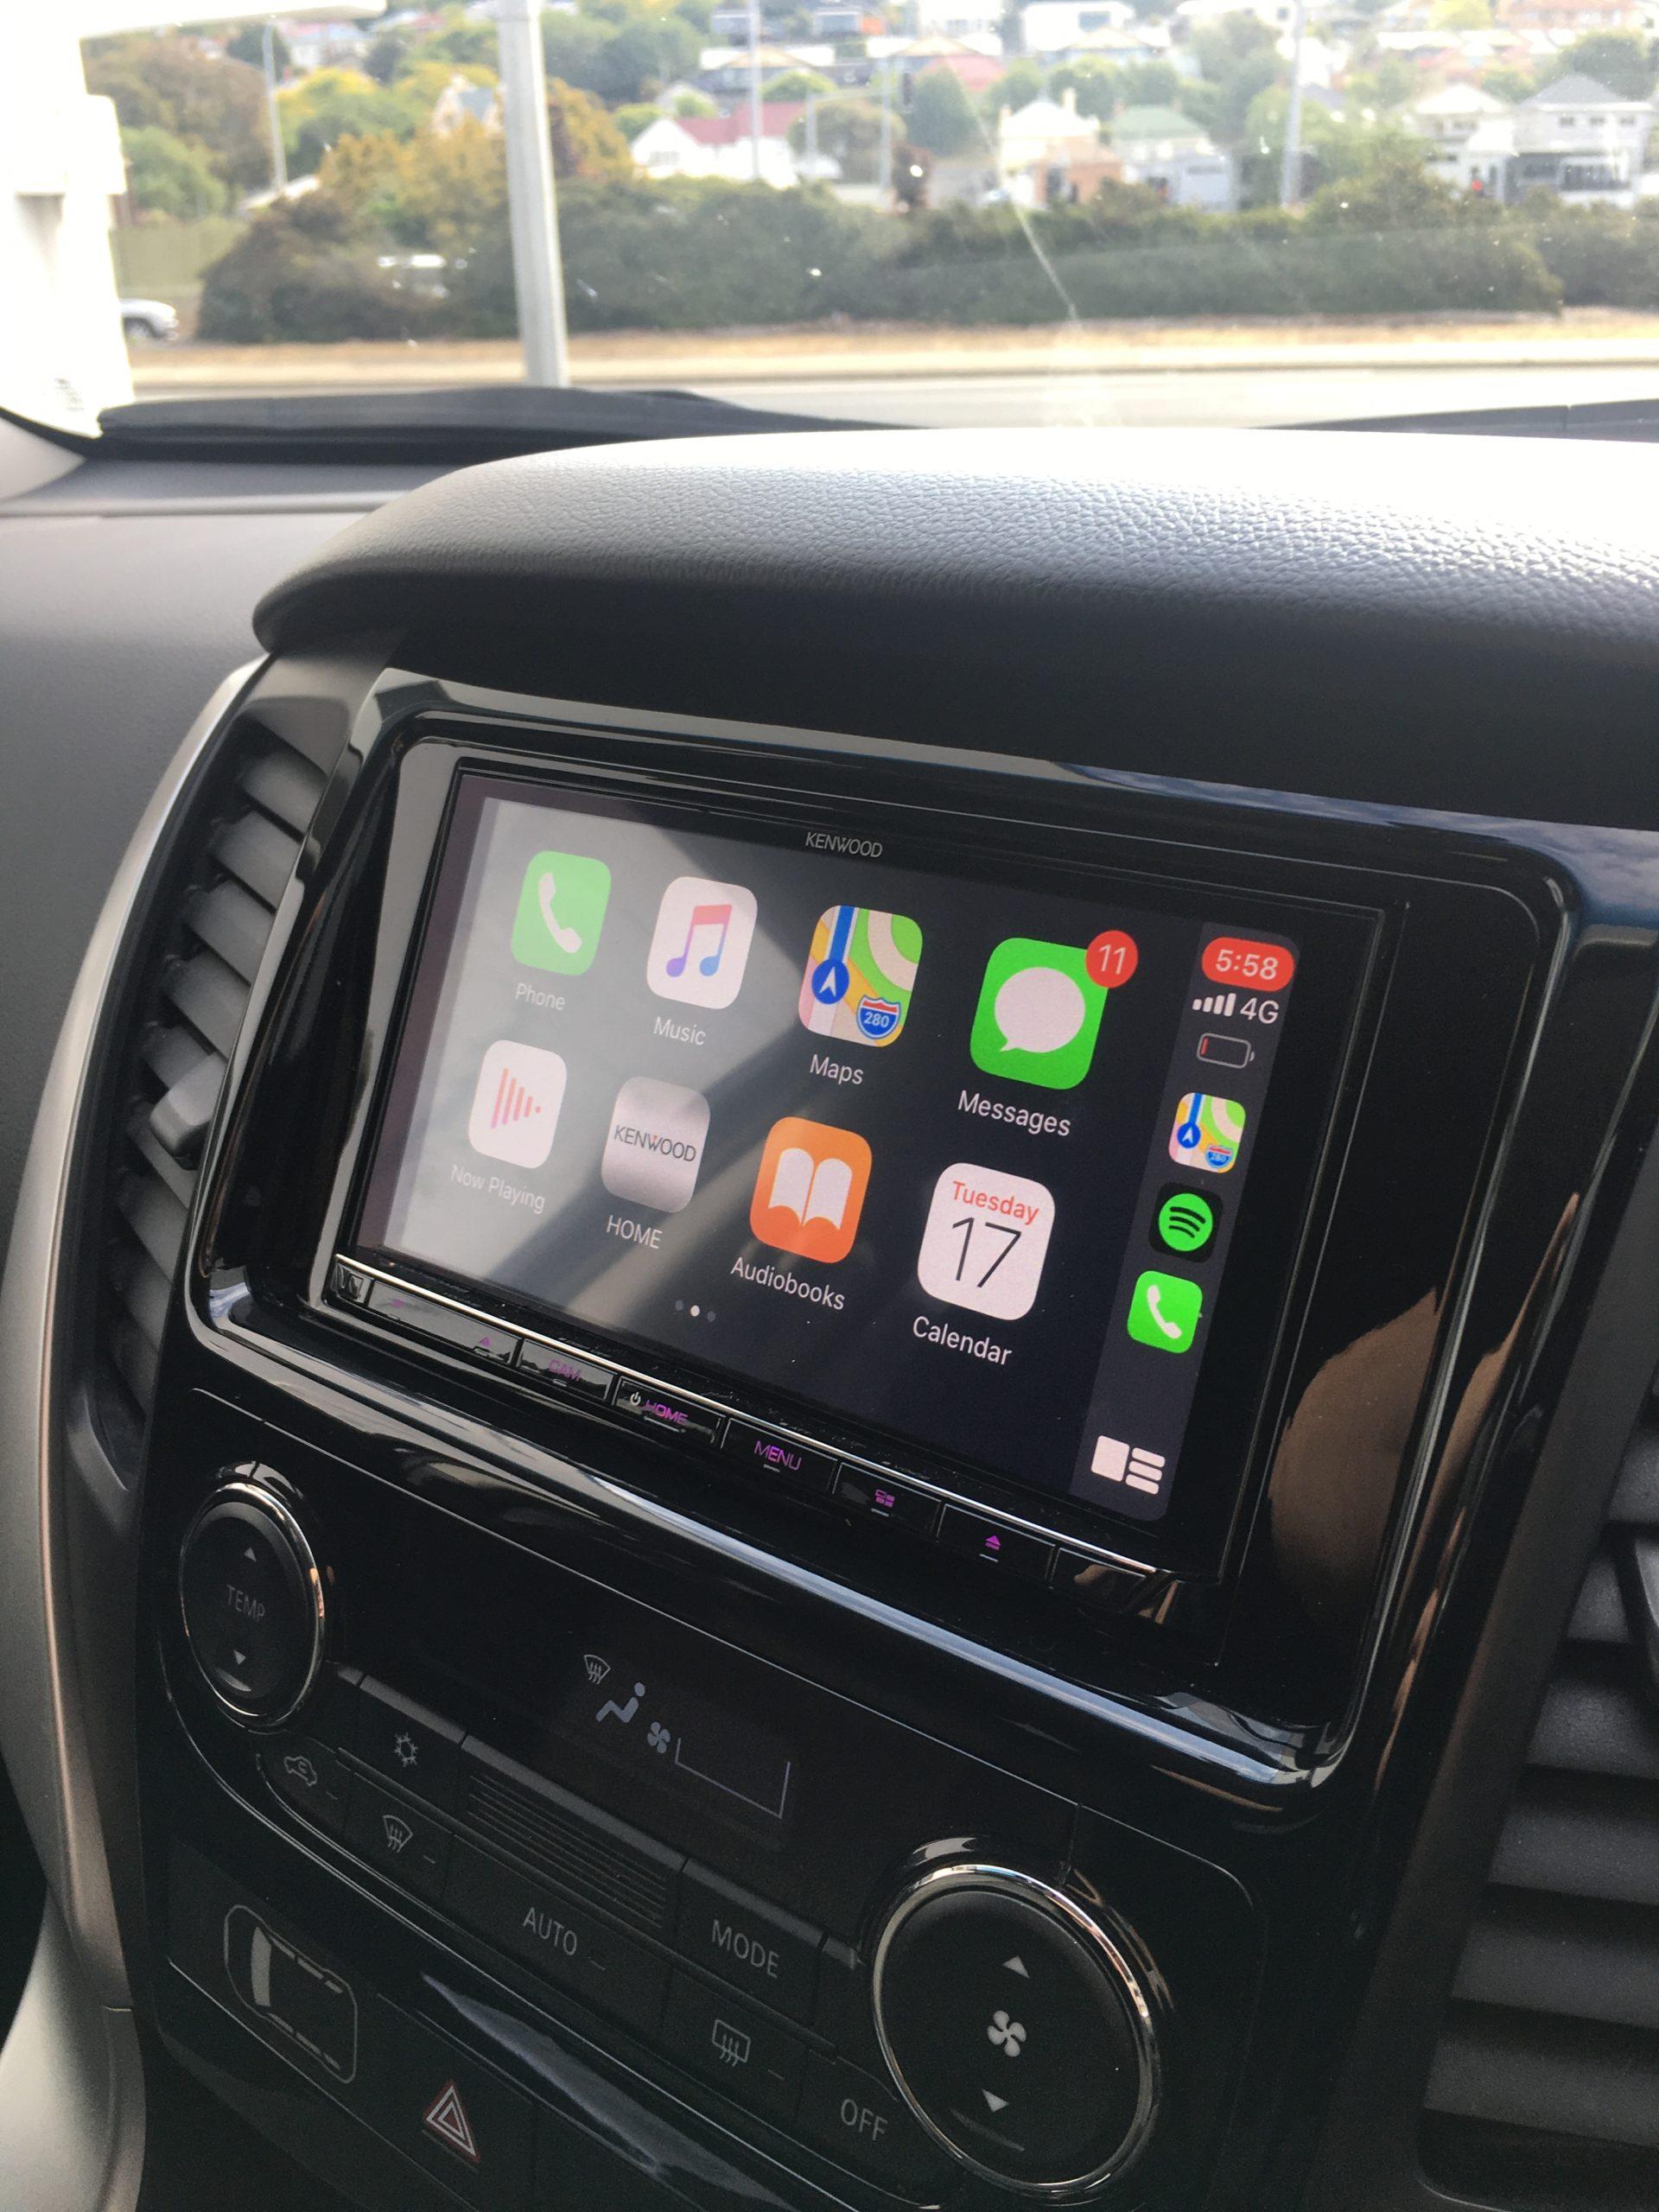 Kenwood wireless CarPlay in Mitsubishi Pajero